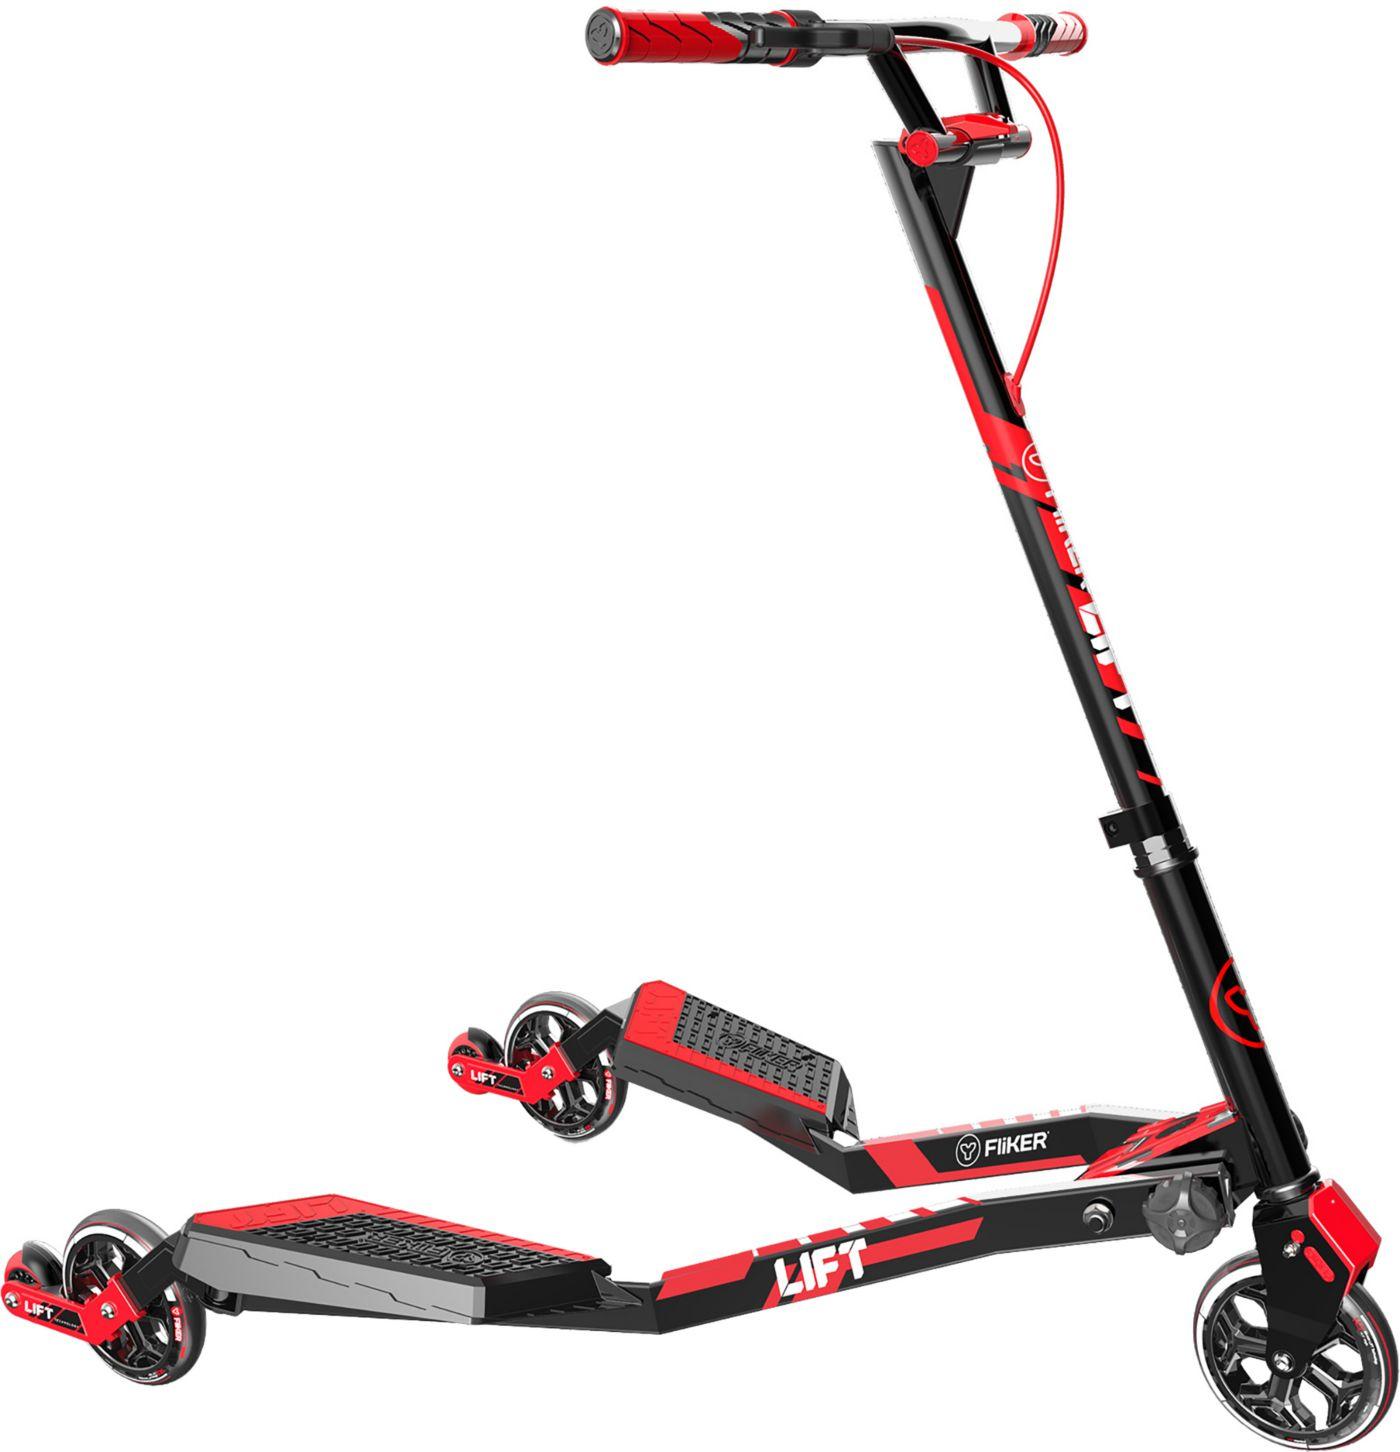 Yvolution Y Fliker LIFT L3 Scooter